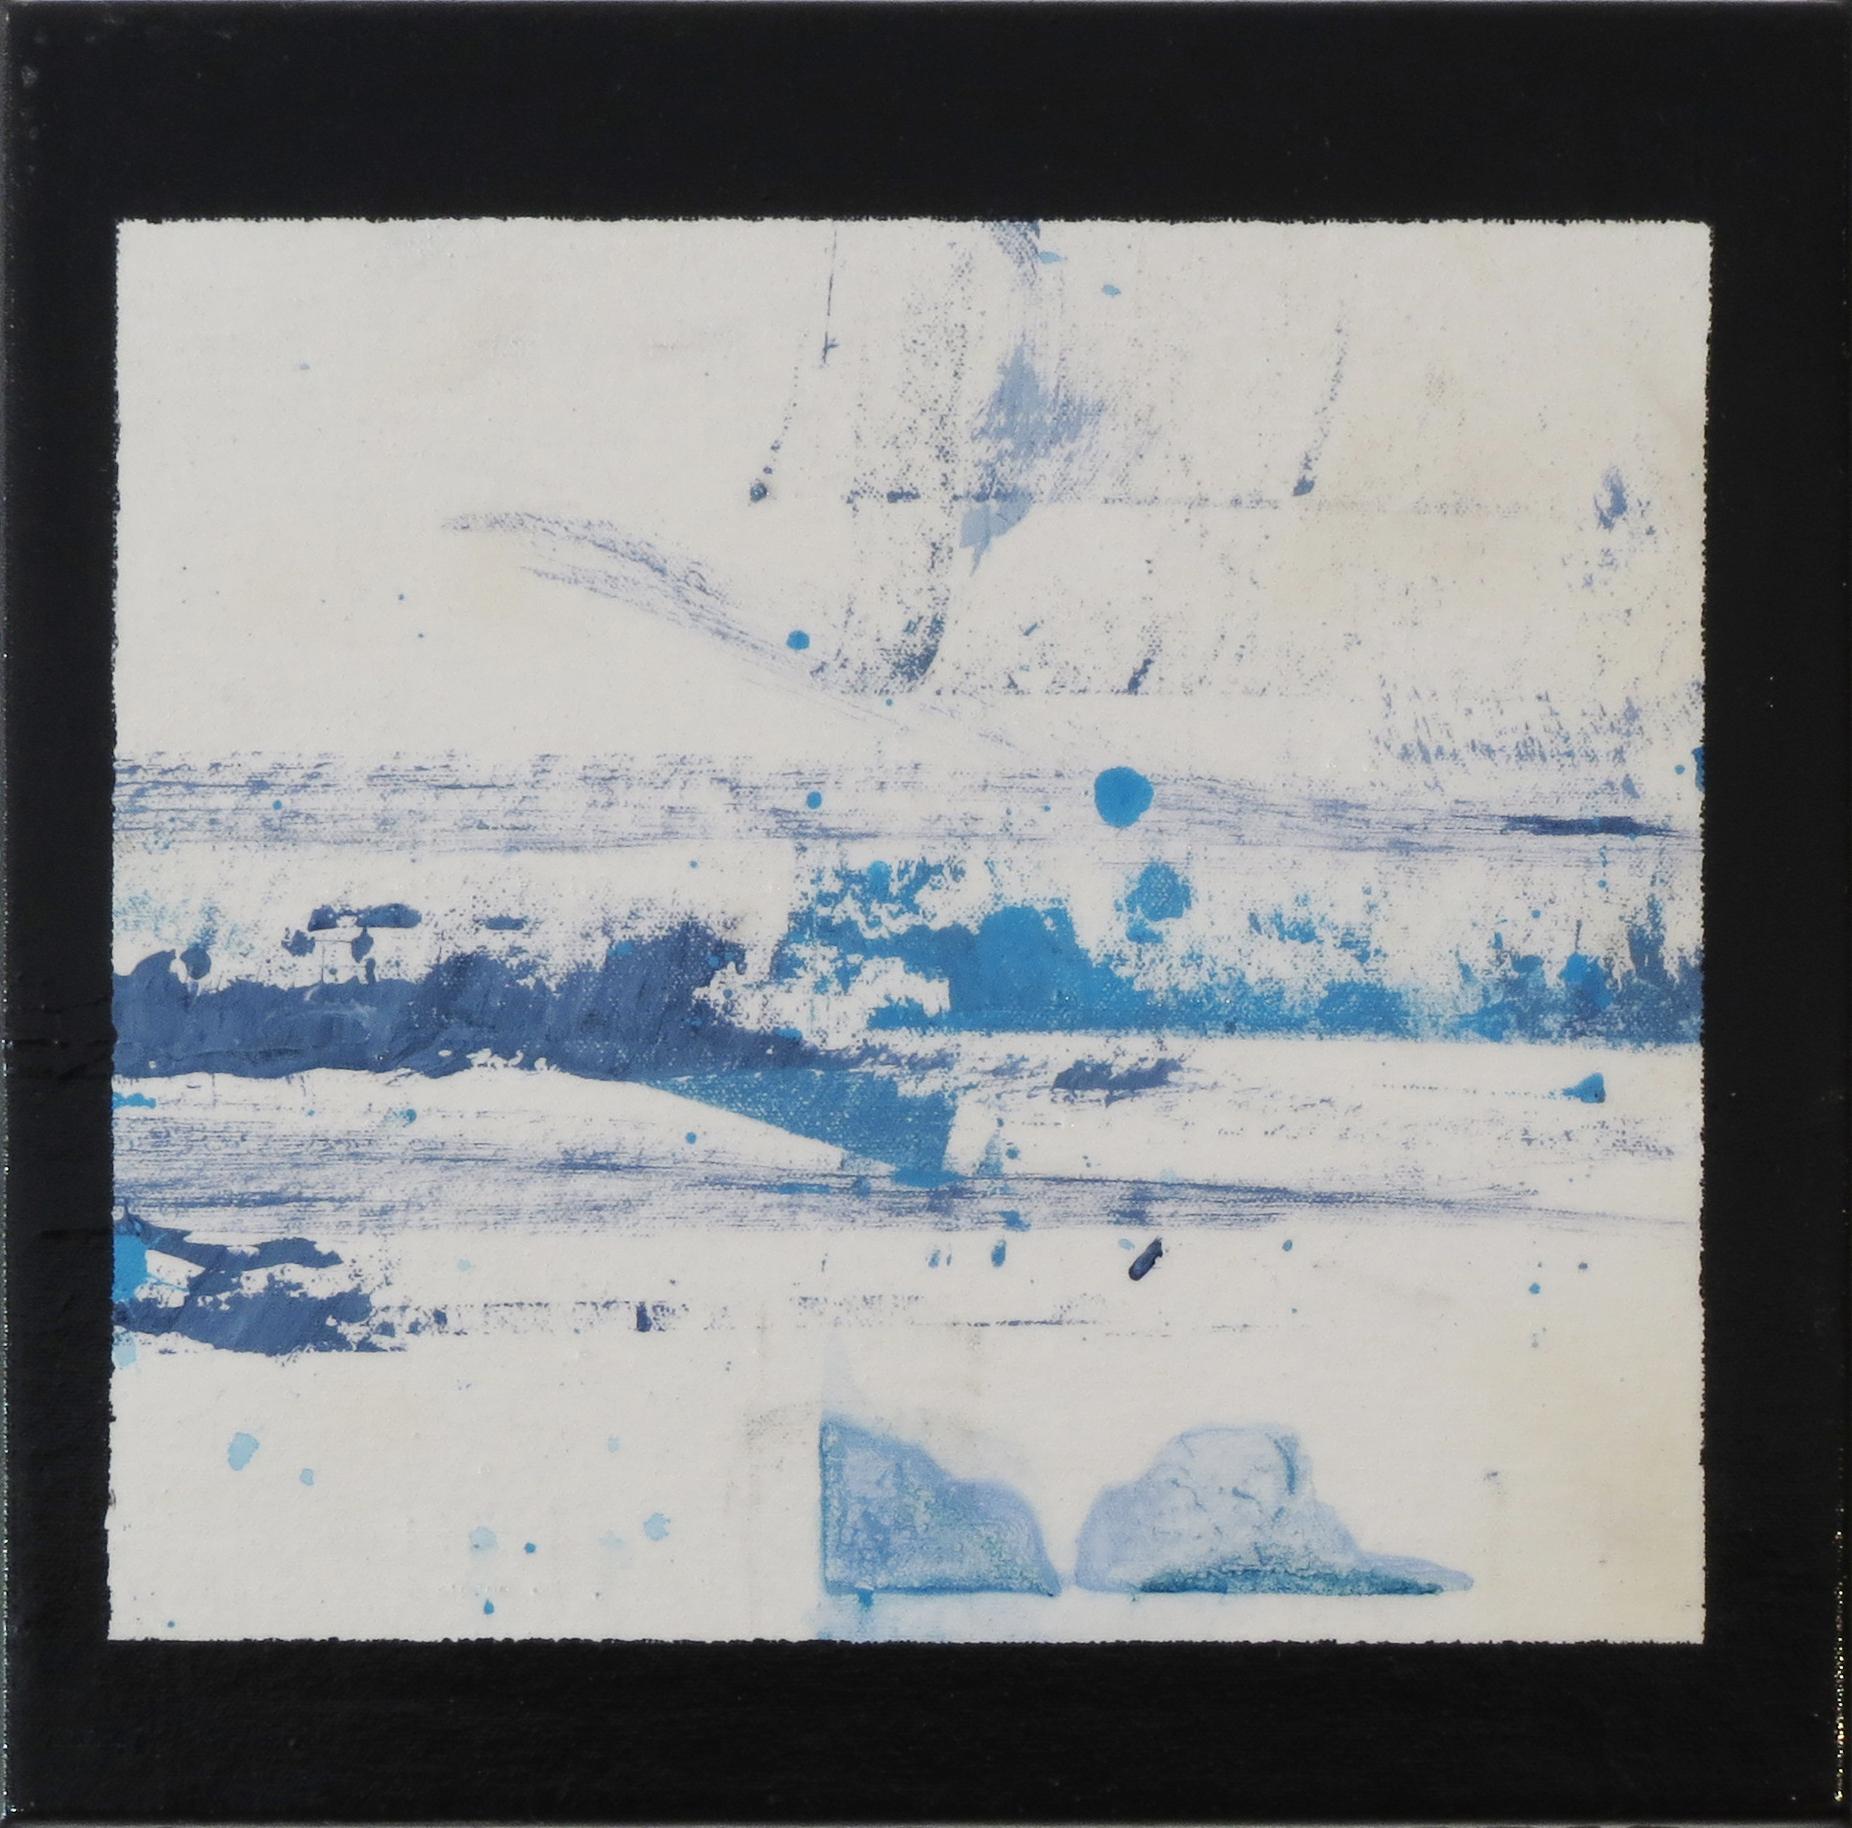 "BLUE AB VII   2013  Dream Series  Acrylic, Wax, Varnish, Canvas  12x12""  SOLD"